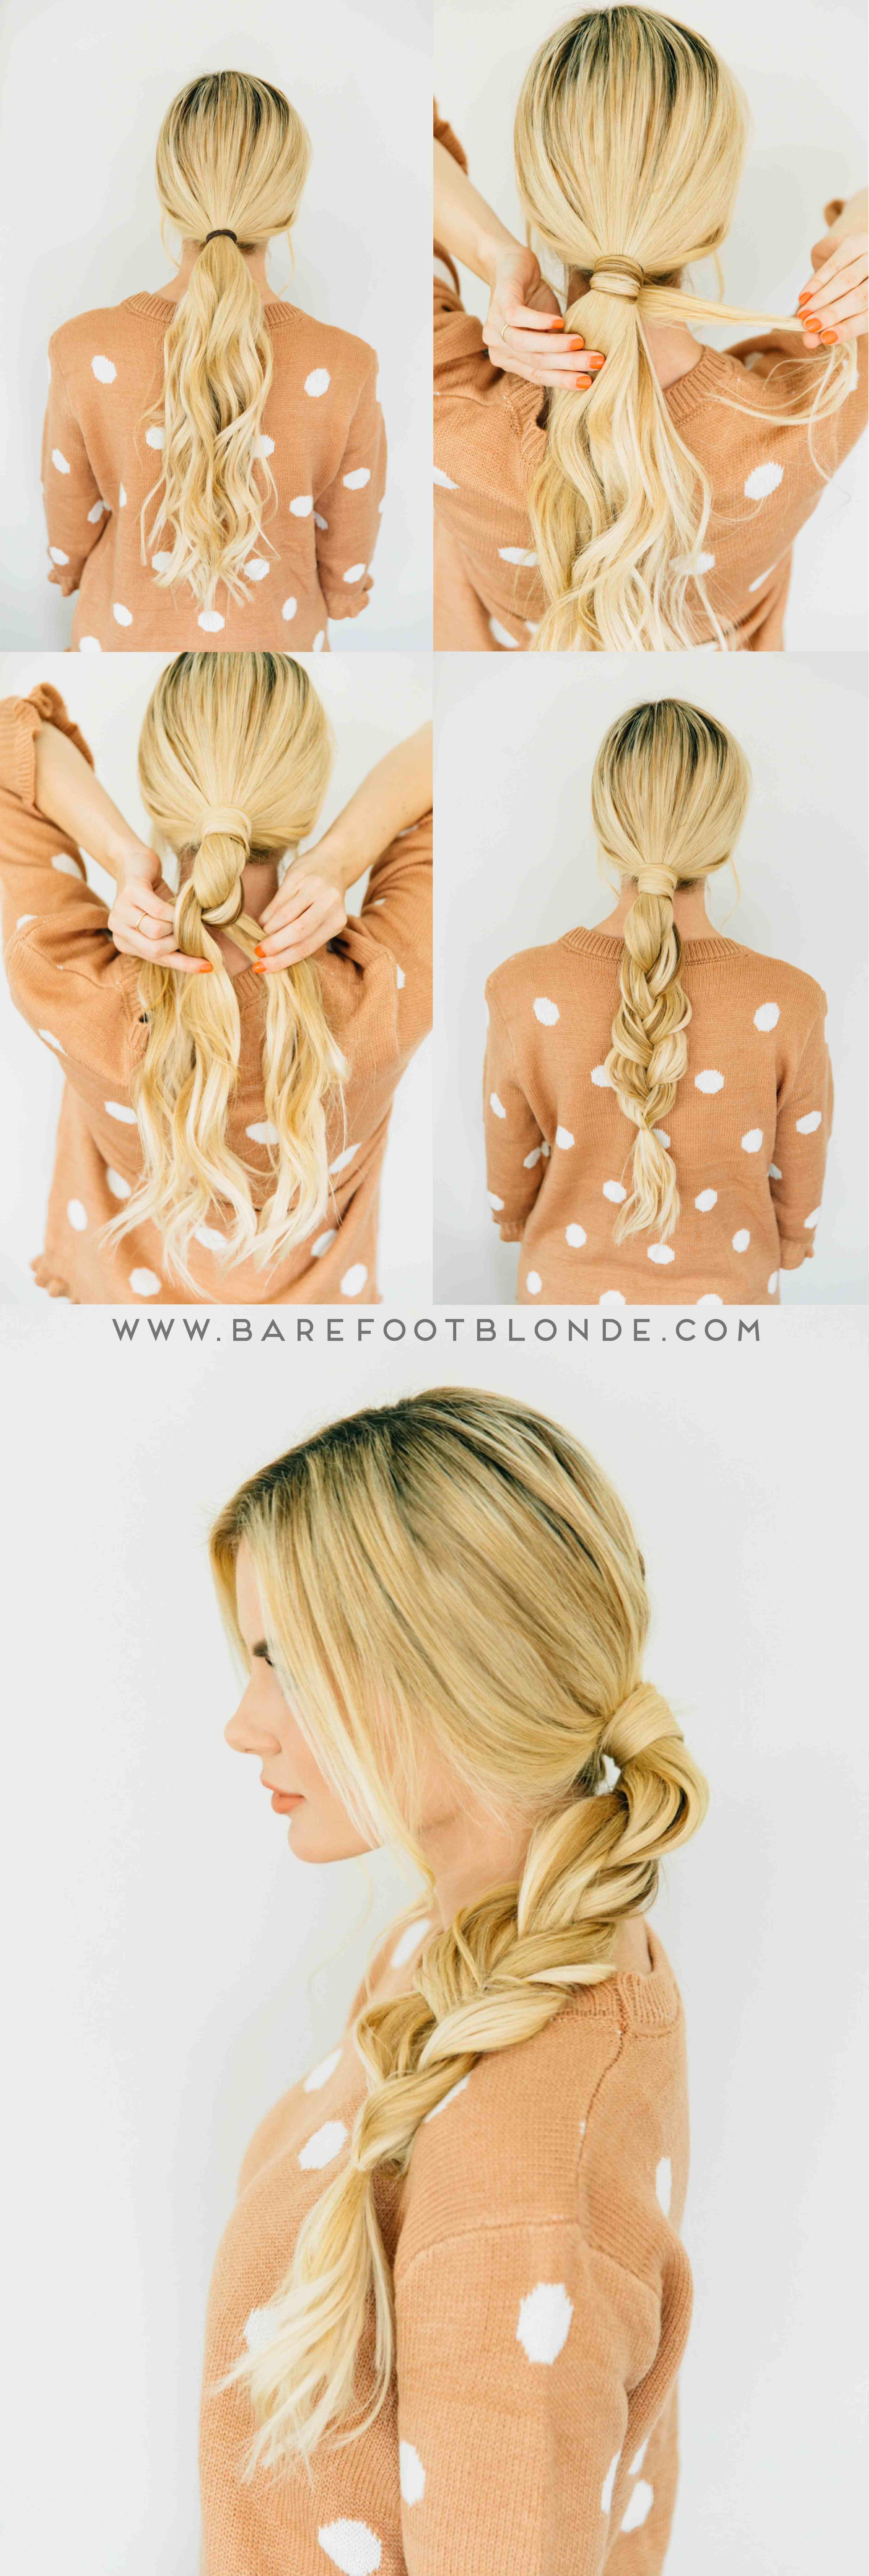 Three easy hairstyles three minutes each hair u beauty